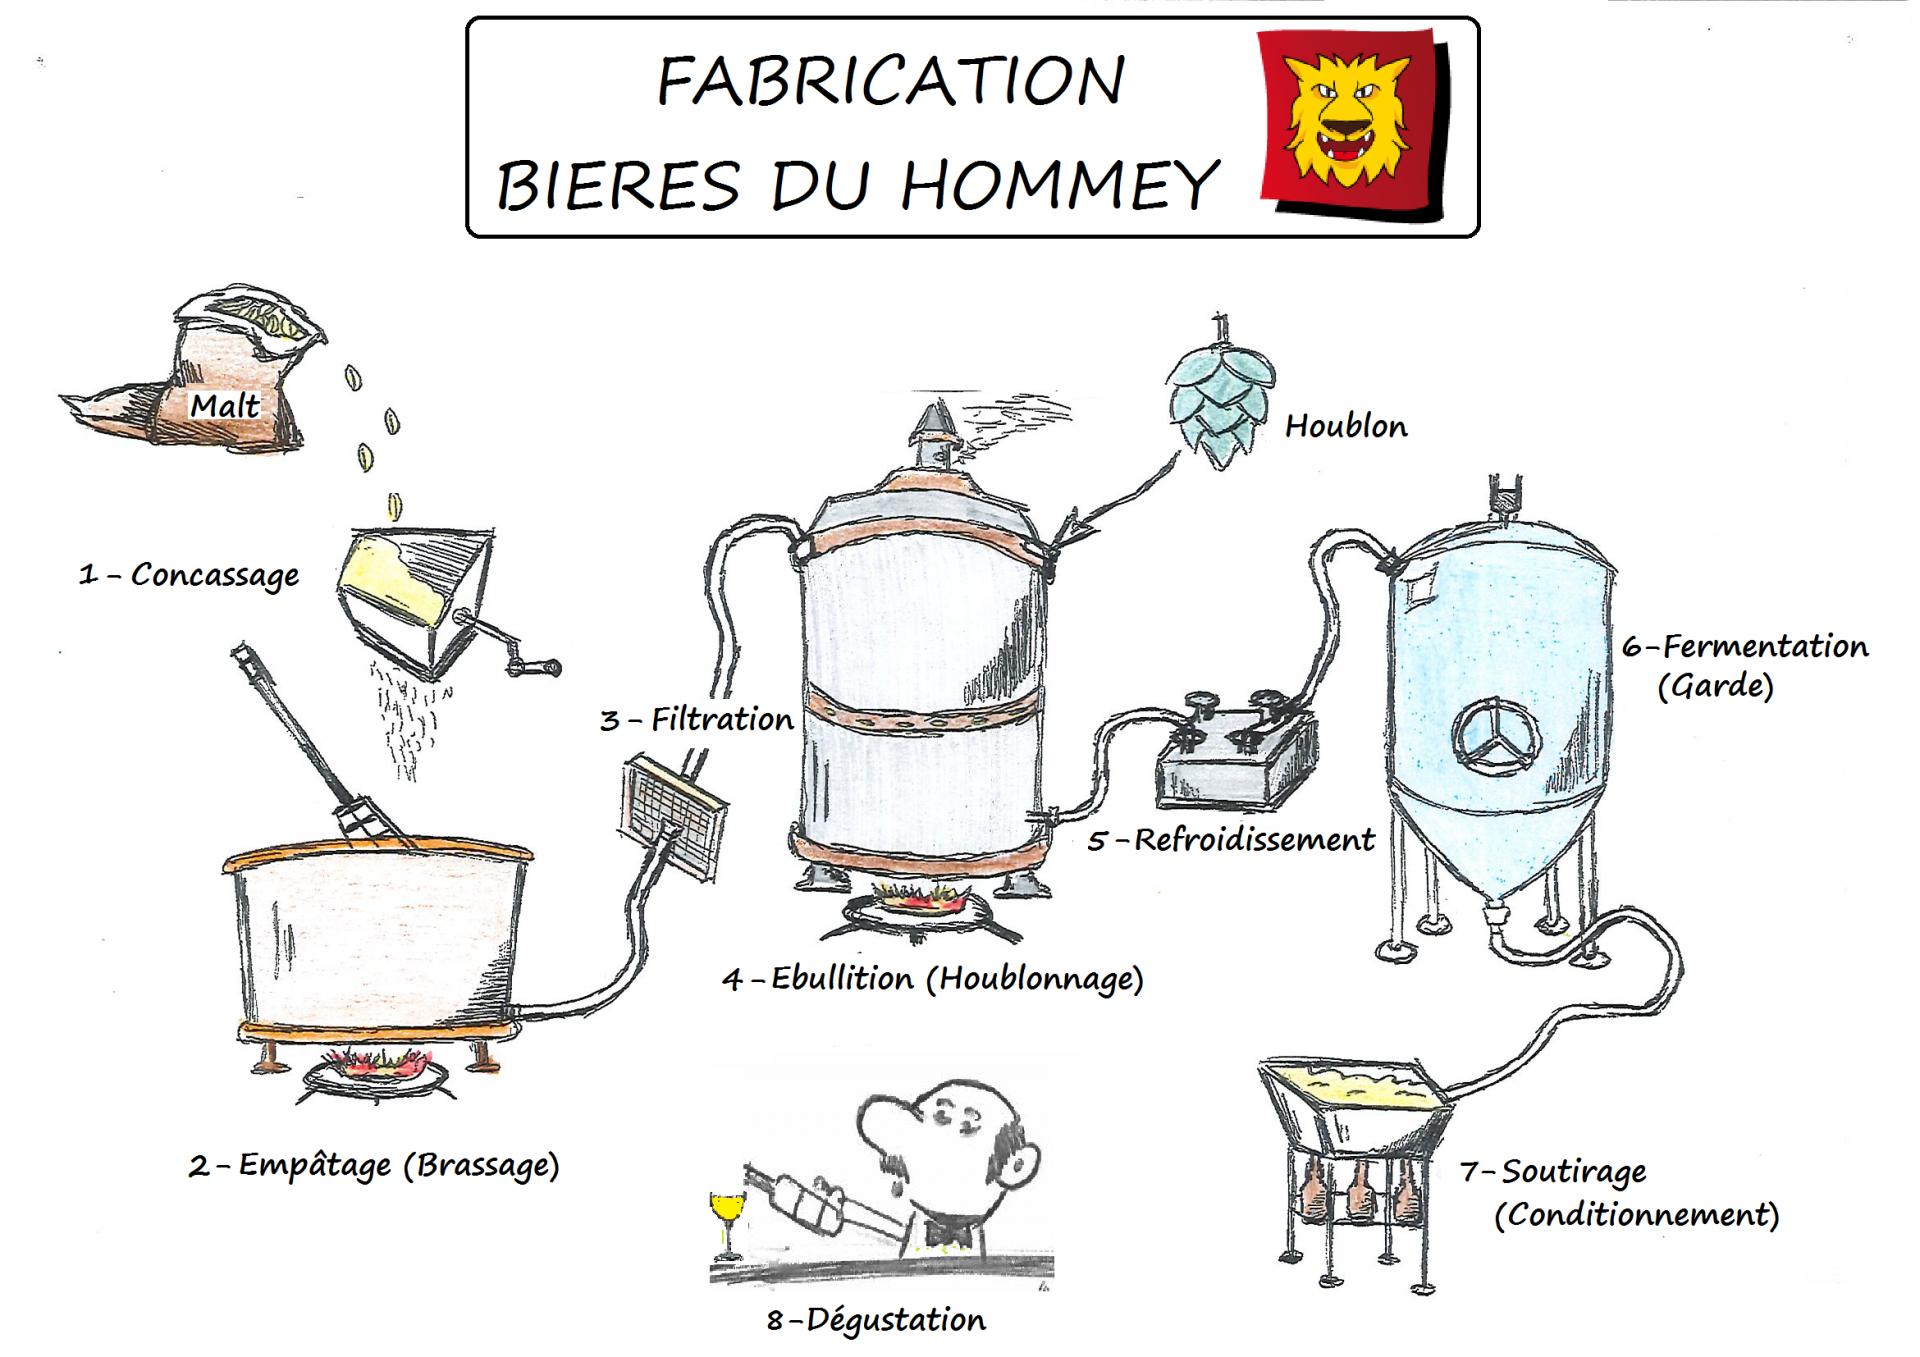 Fabrication biere du hommey dessin